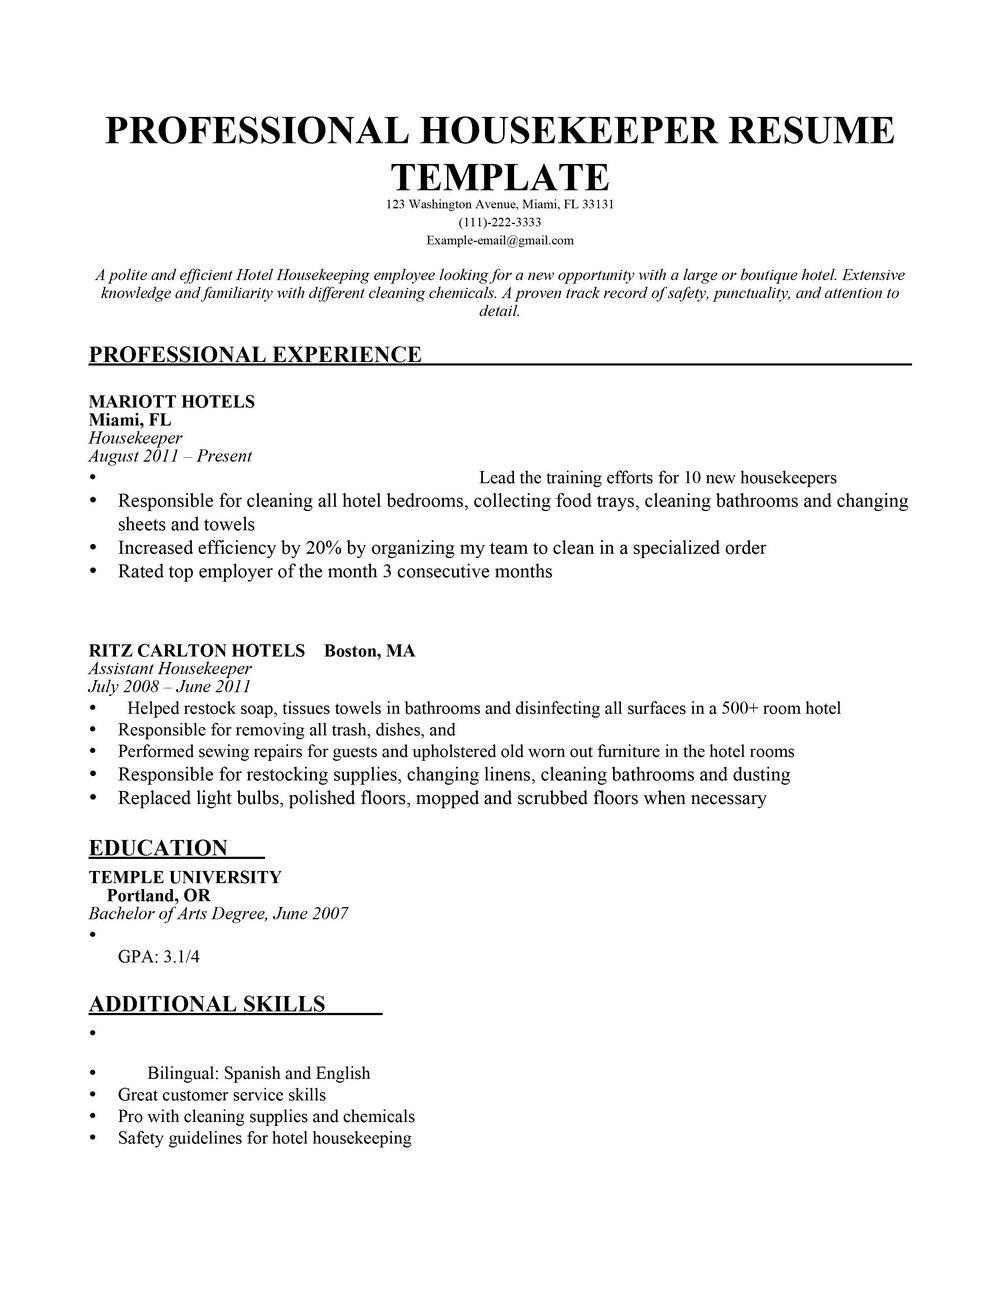 Resume Templates For Housekeeping Jobs Resumes Mtu2mg